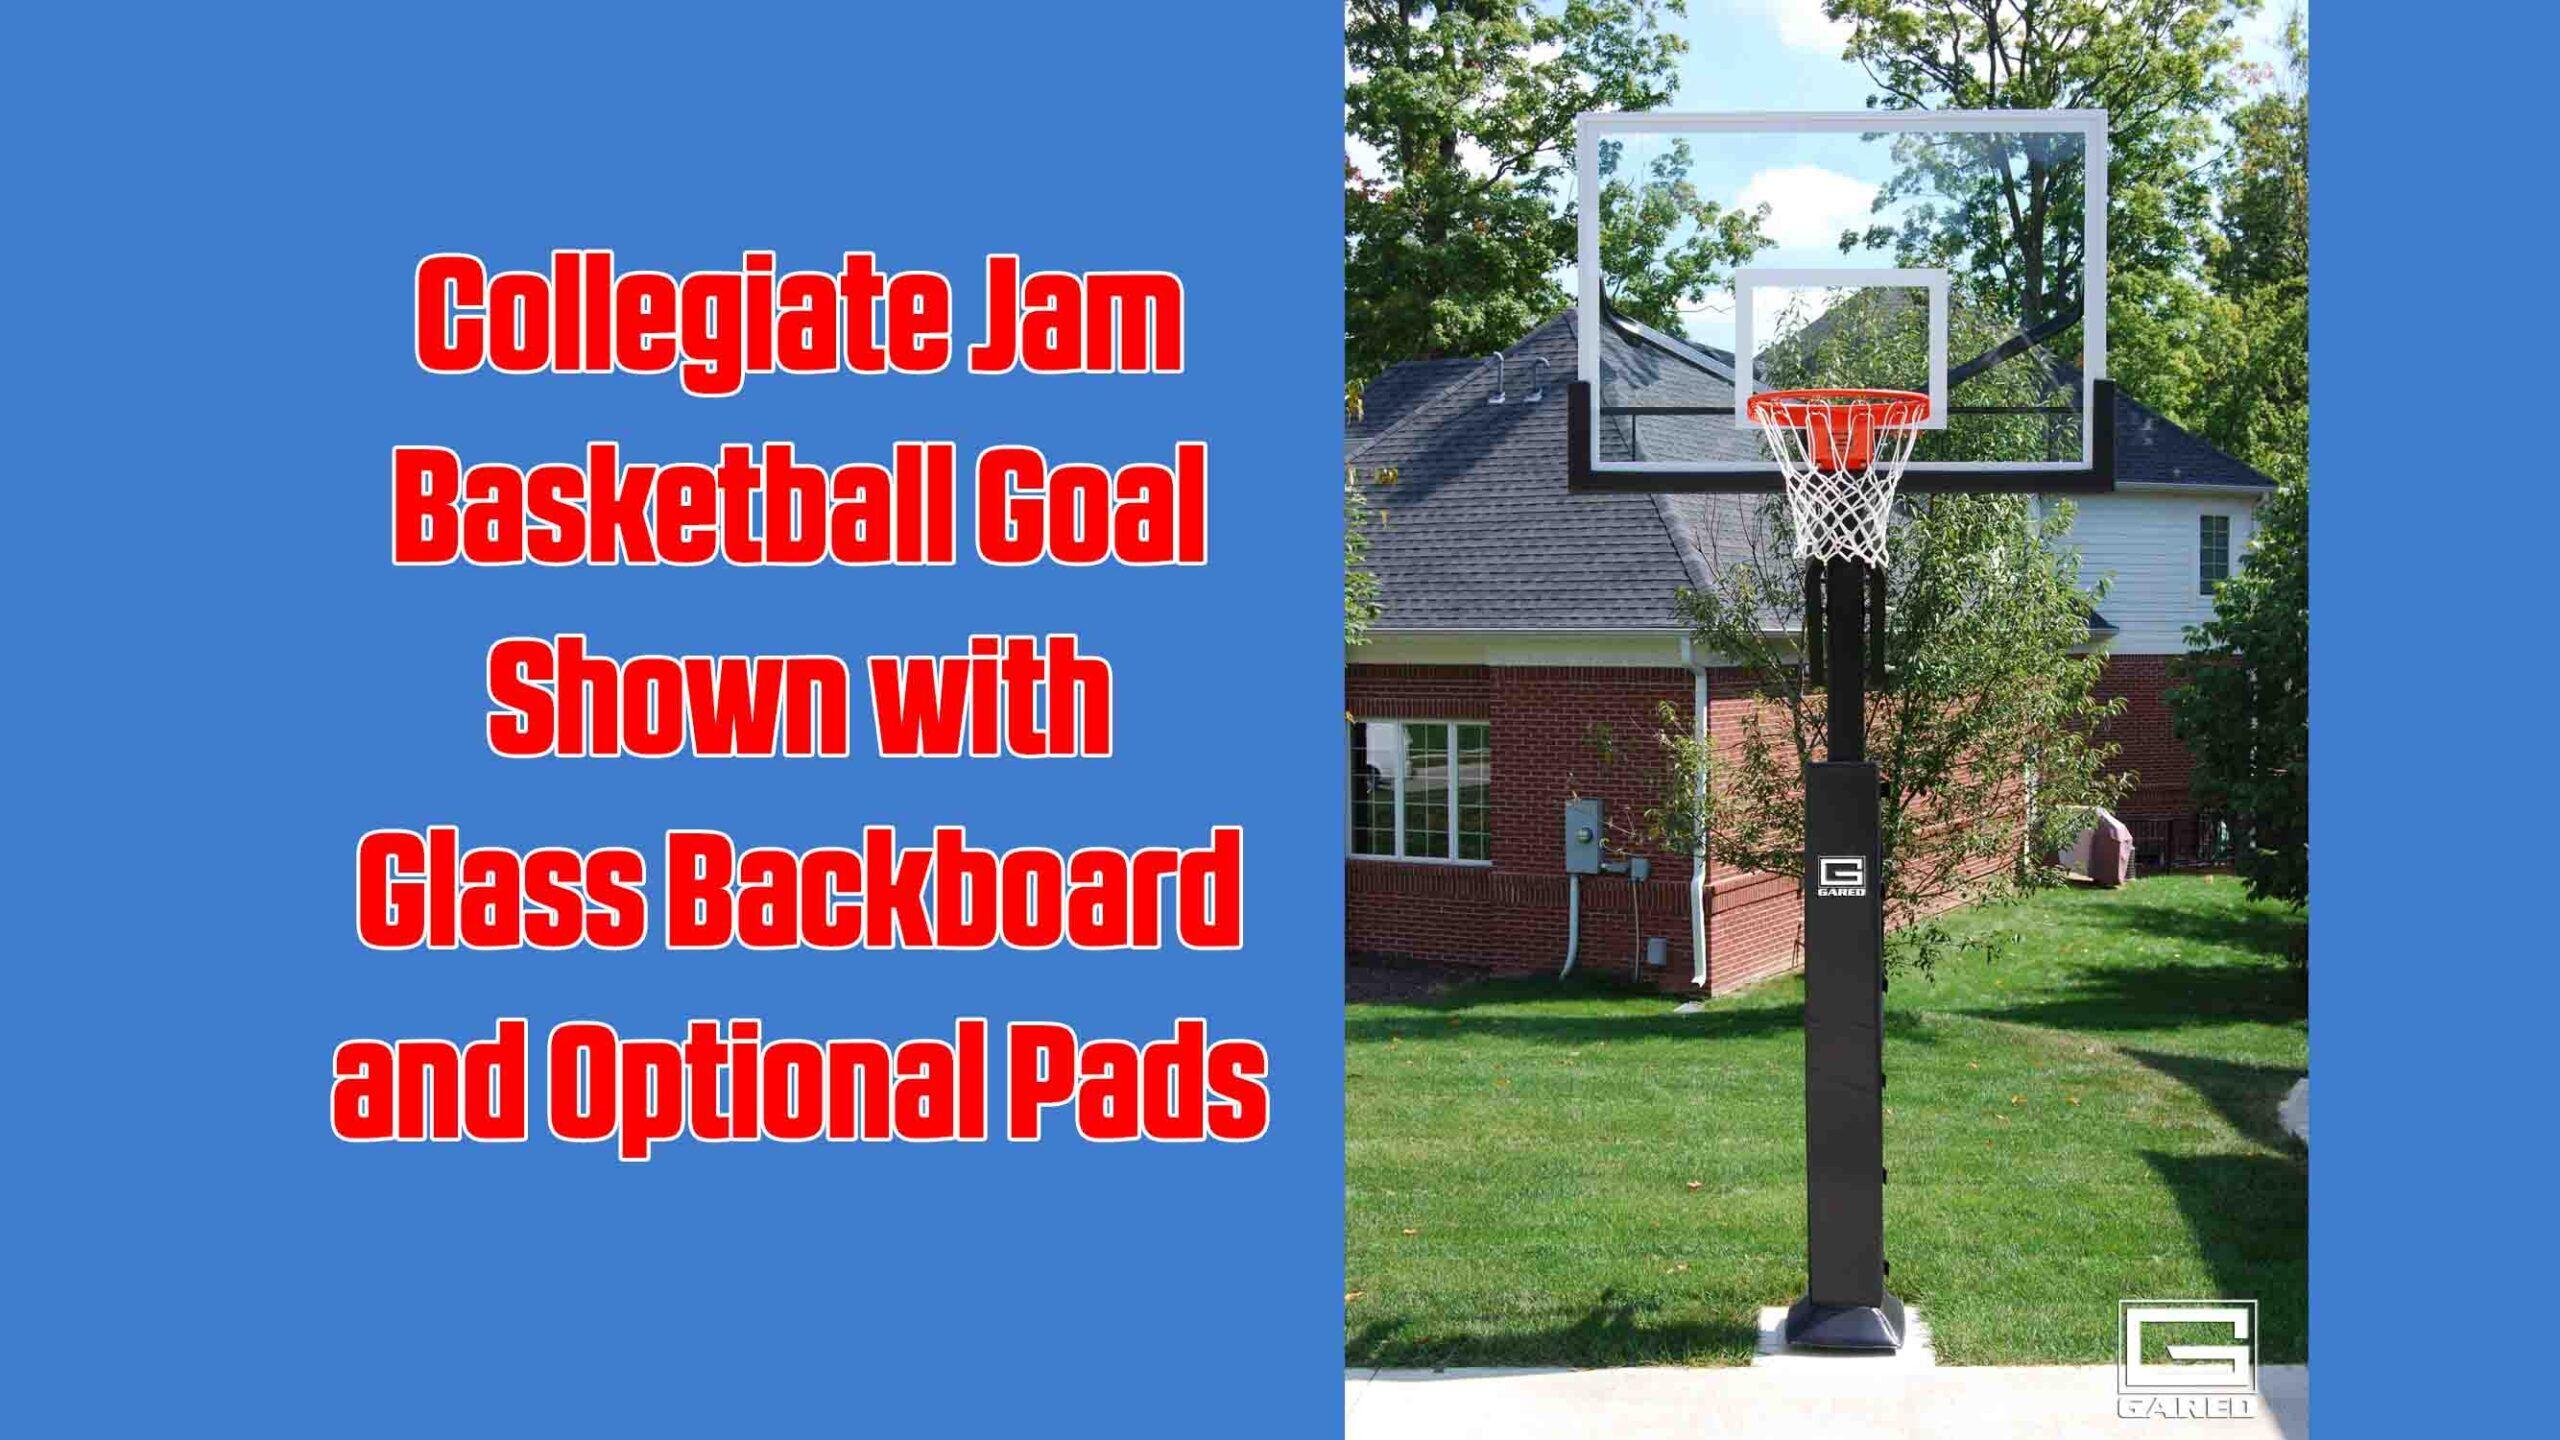 Collegiate Jam Basketball Goal with Glass Backboard